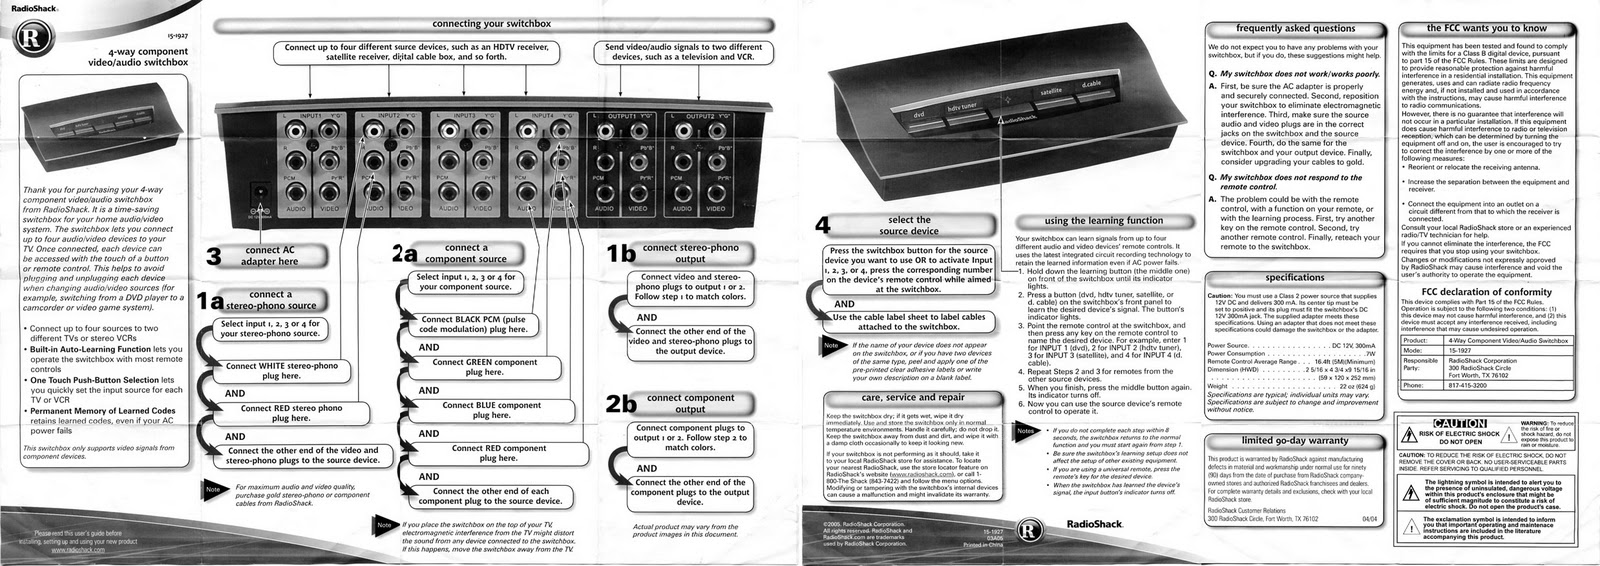 Pea Brane Radioshack 15 1927 2 Way Audio Switch Box Radio Shack 4 Output Component Composite Video